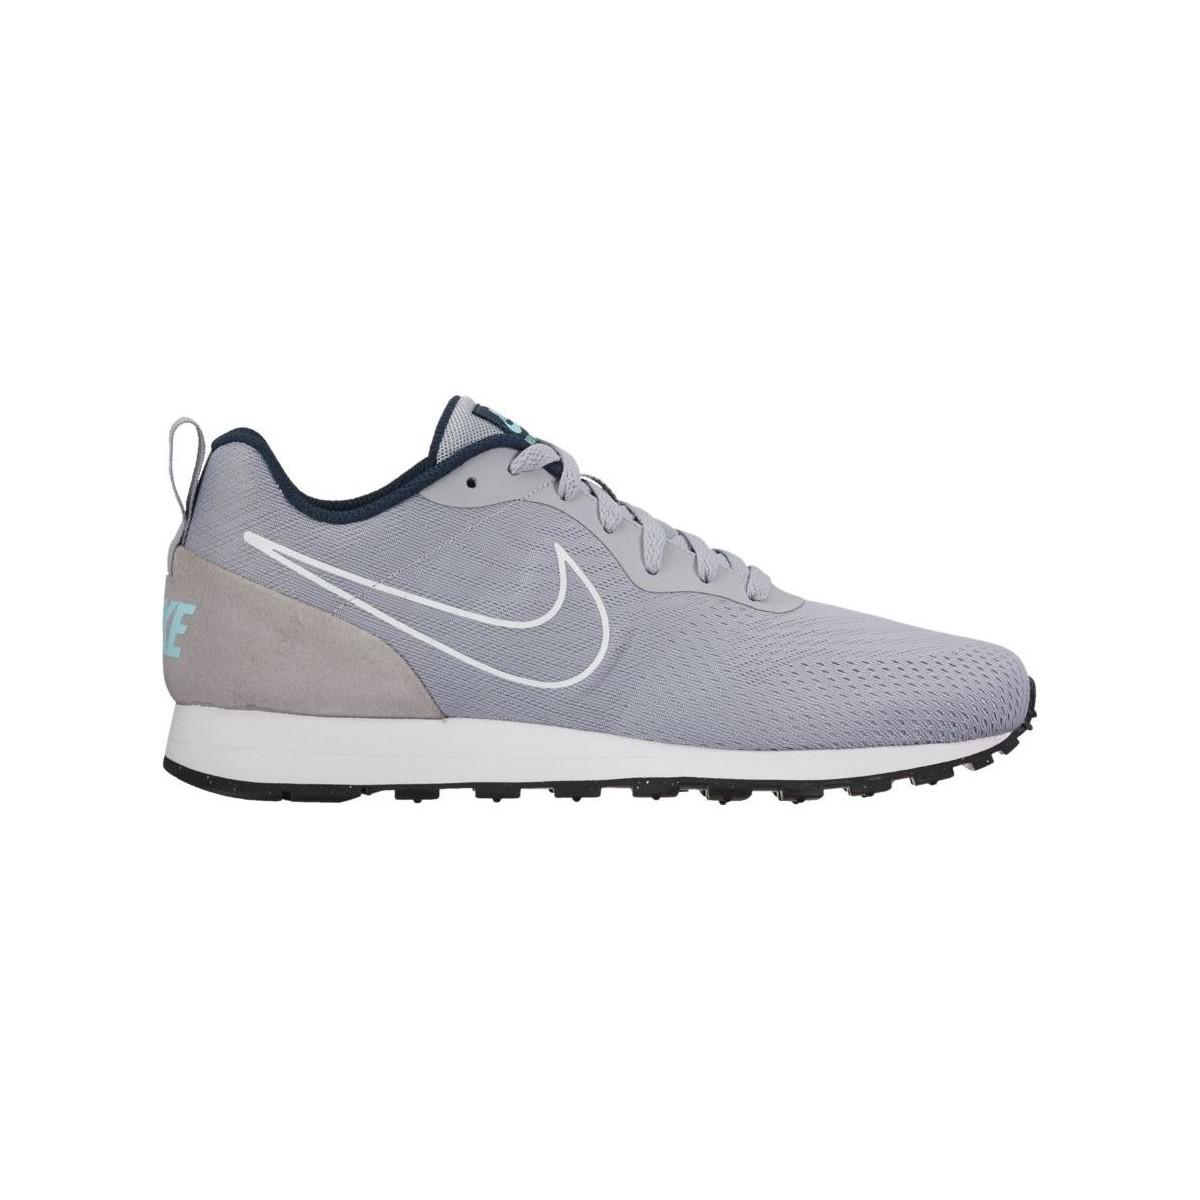 Hacia abajo Acuerdo Tierras altas  Nike Md Runner 2 Mesh Shoe Men's Shoes (trainers) In Grey in Gray ...